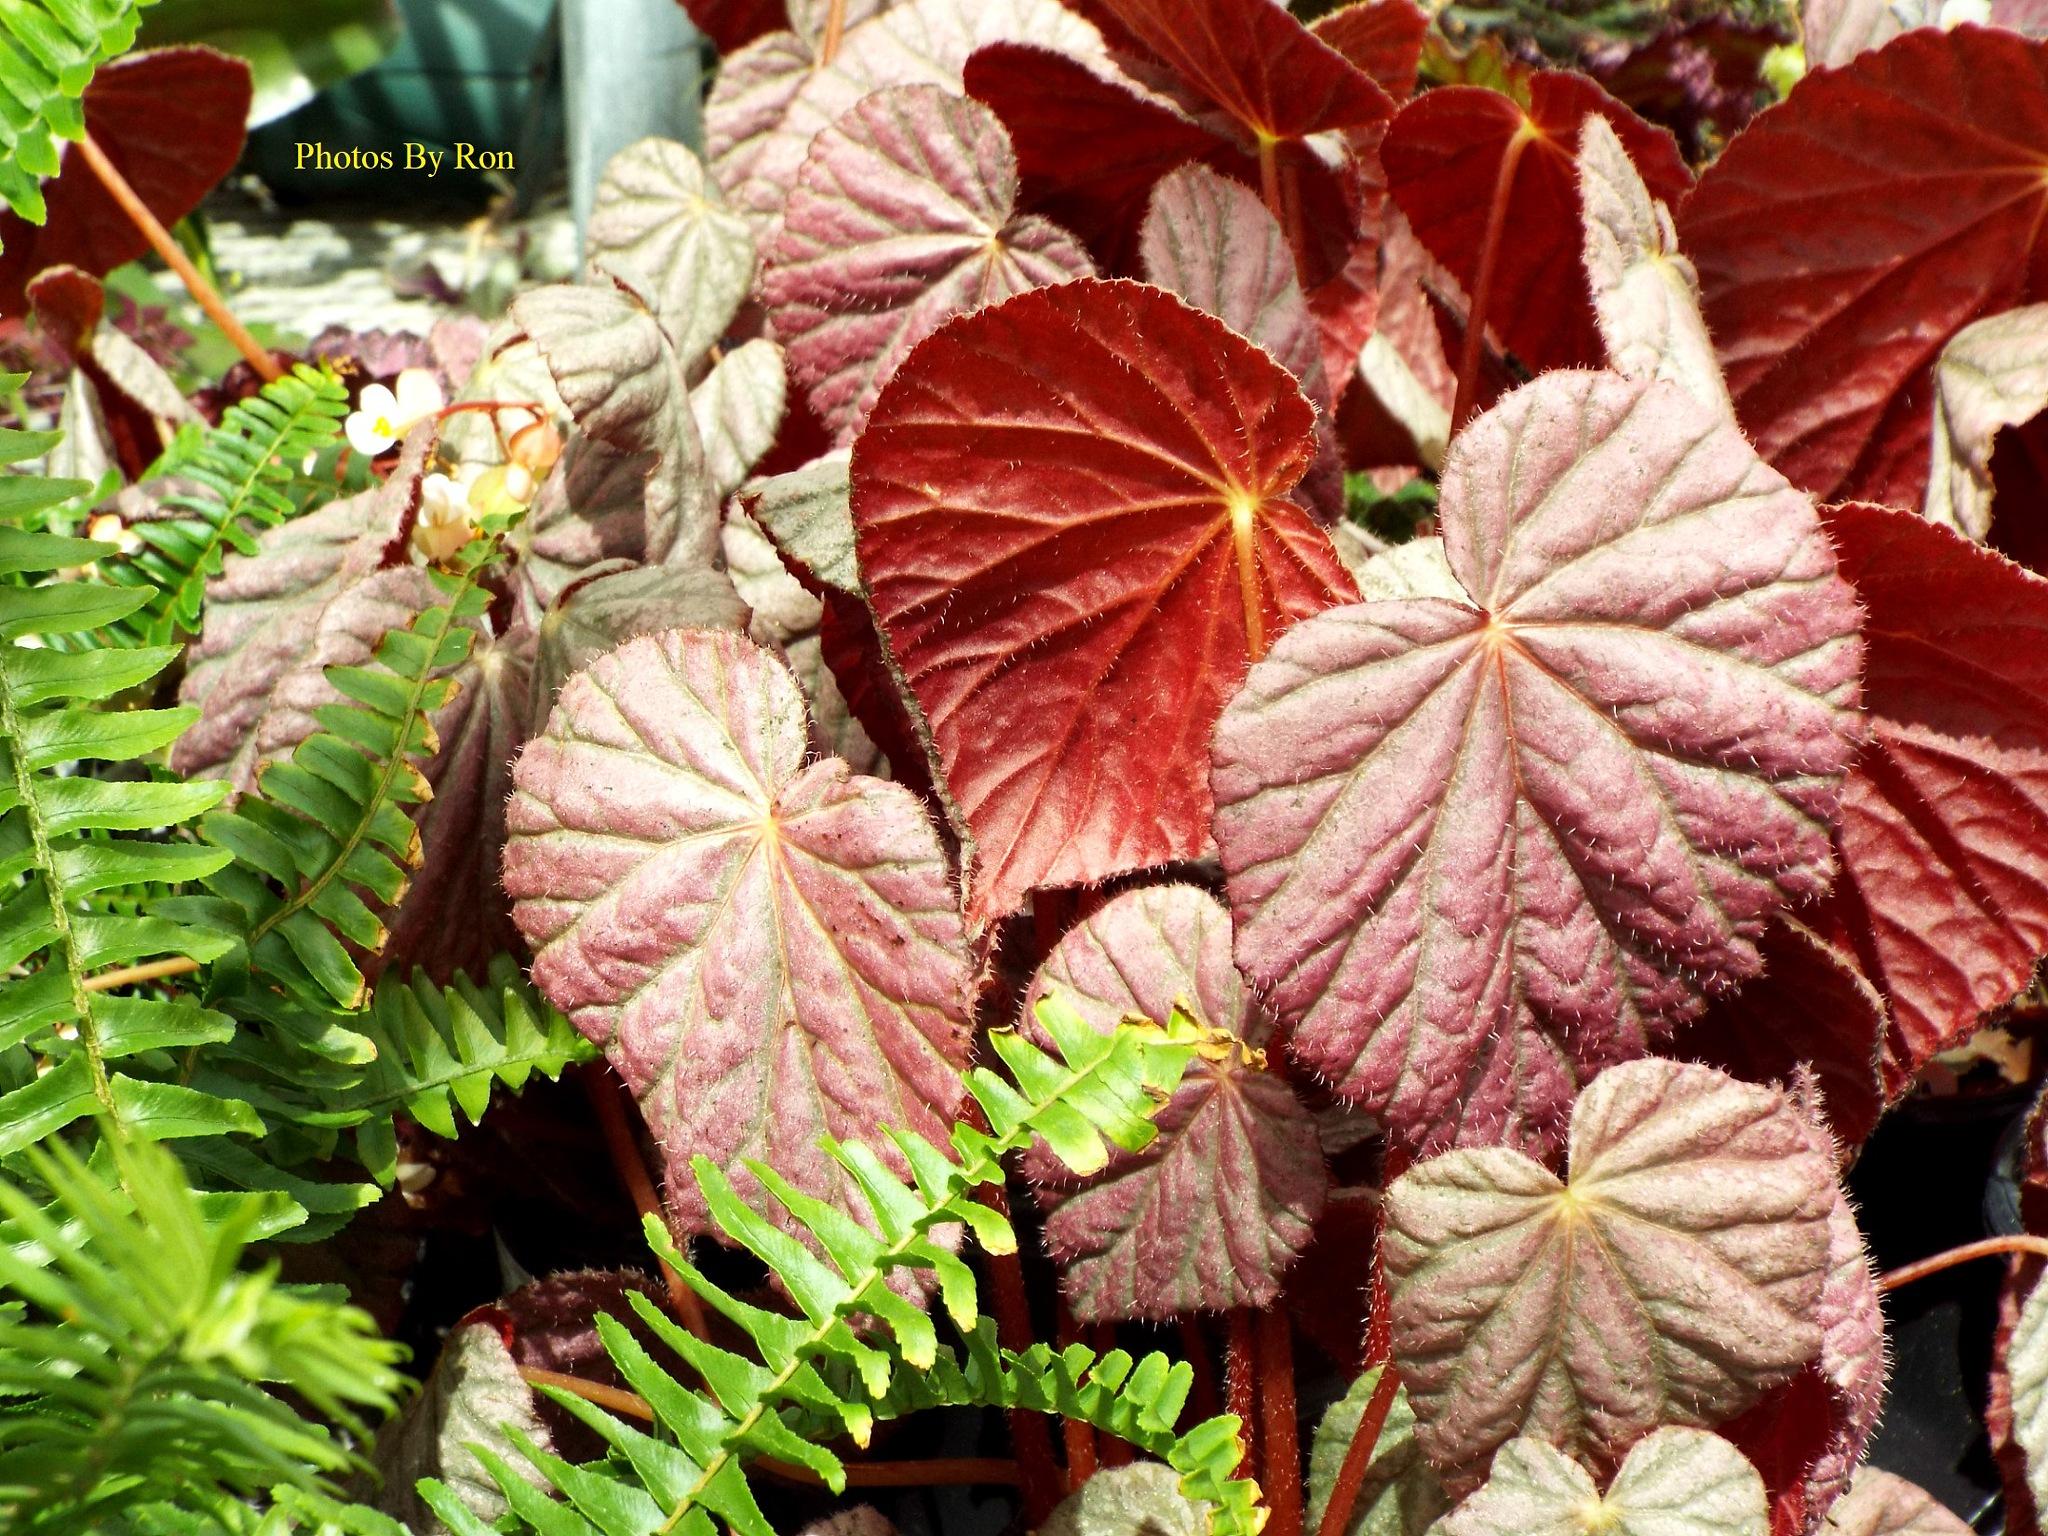 """Ferns & Leaves"" by Ron Berkley"